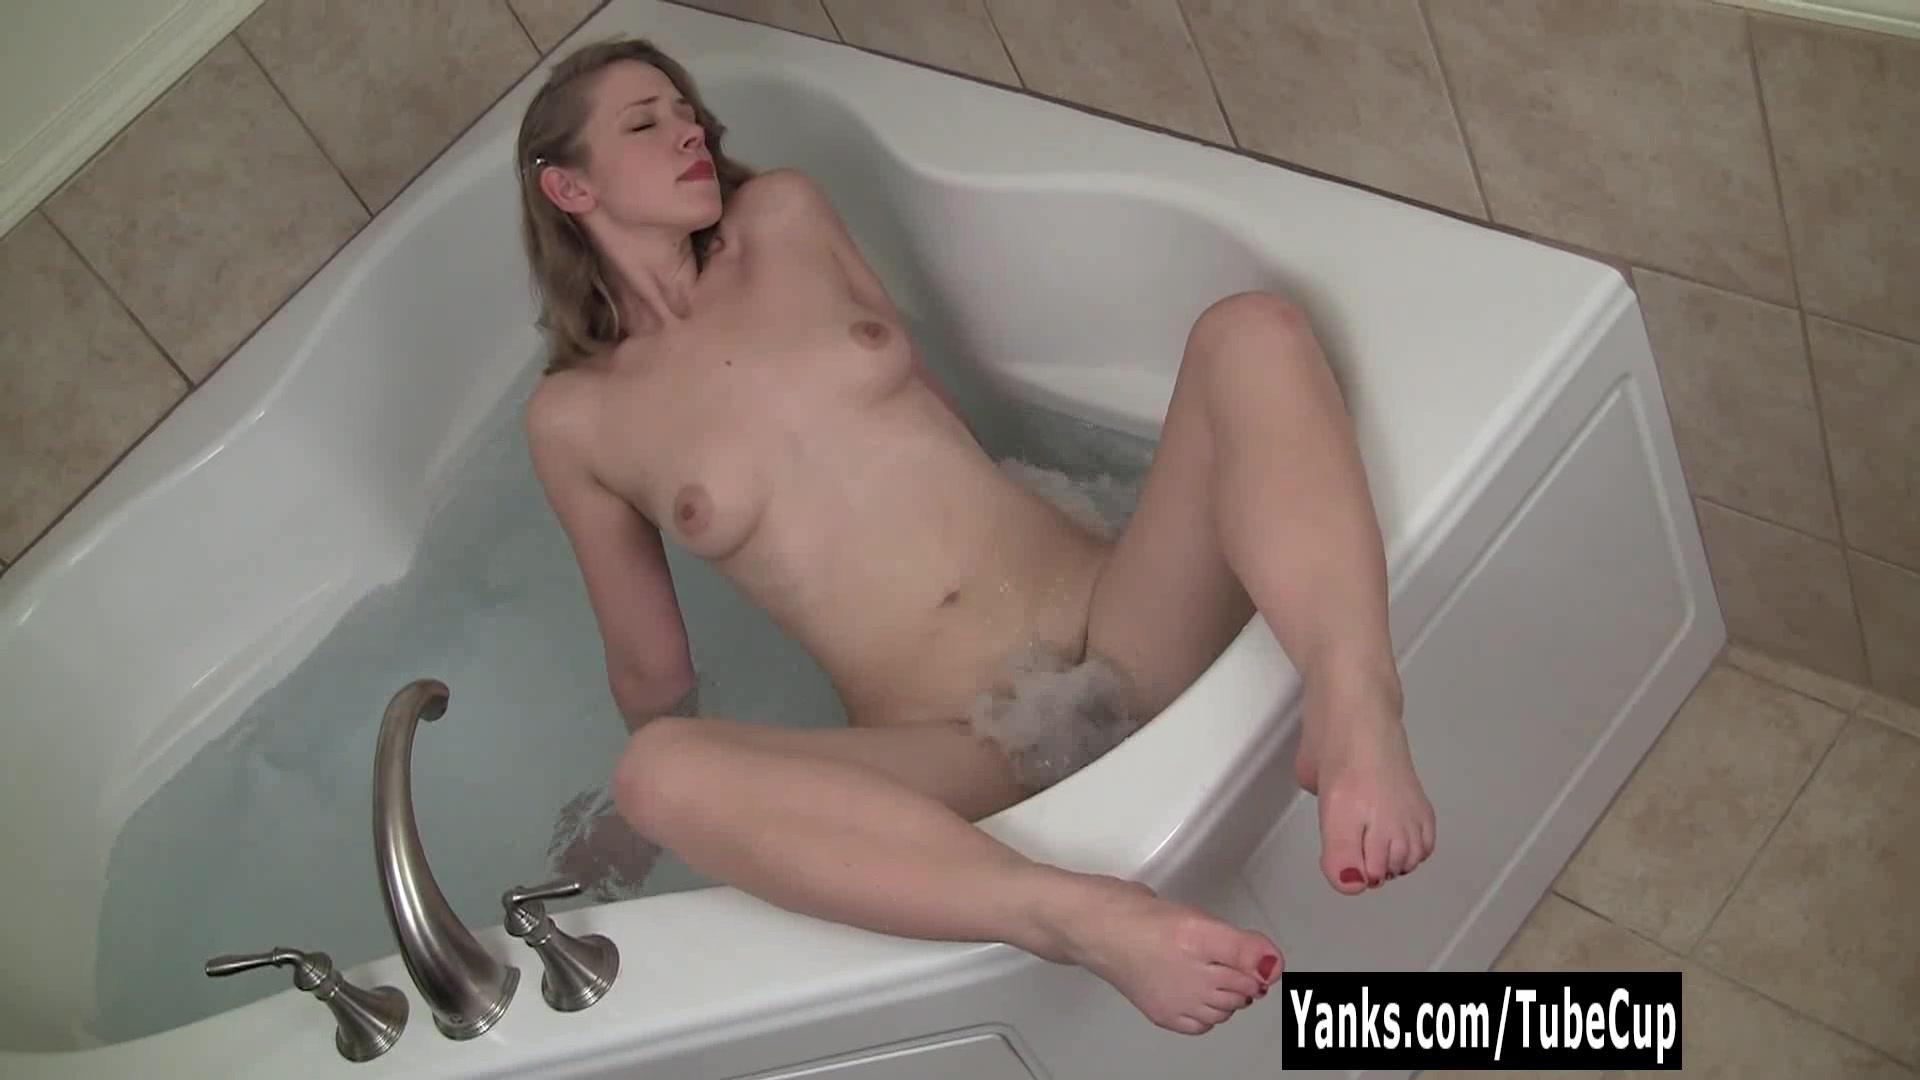 Мастурбирует в ванне скрытая камера - Онлайн порно нарезки для самых ...